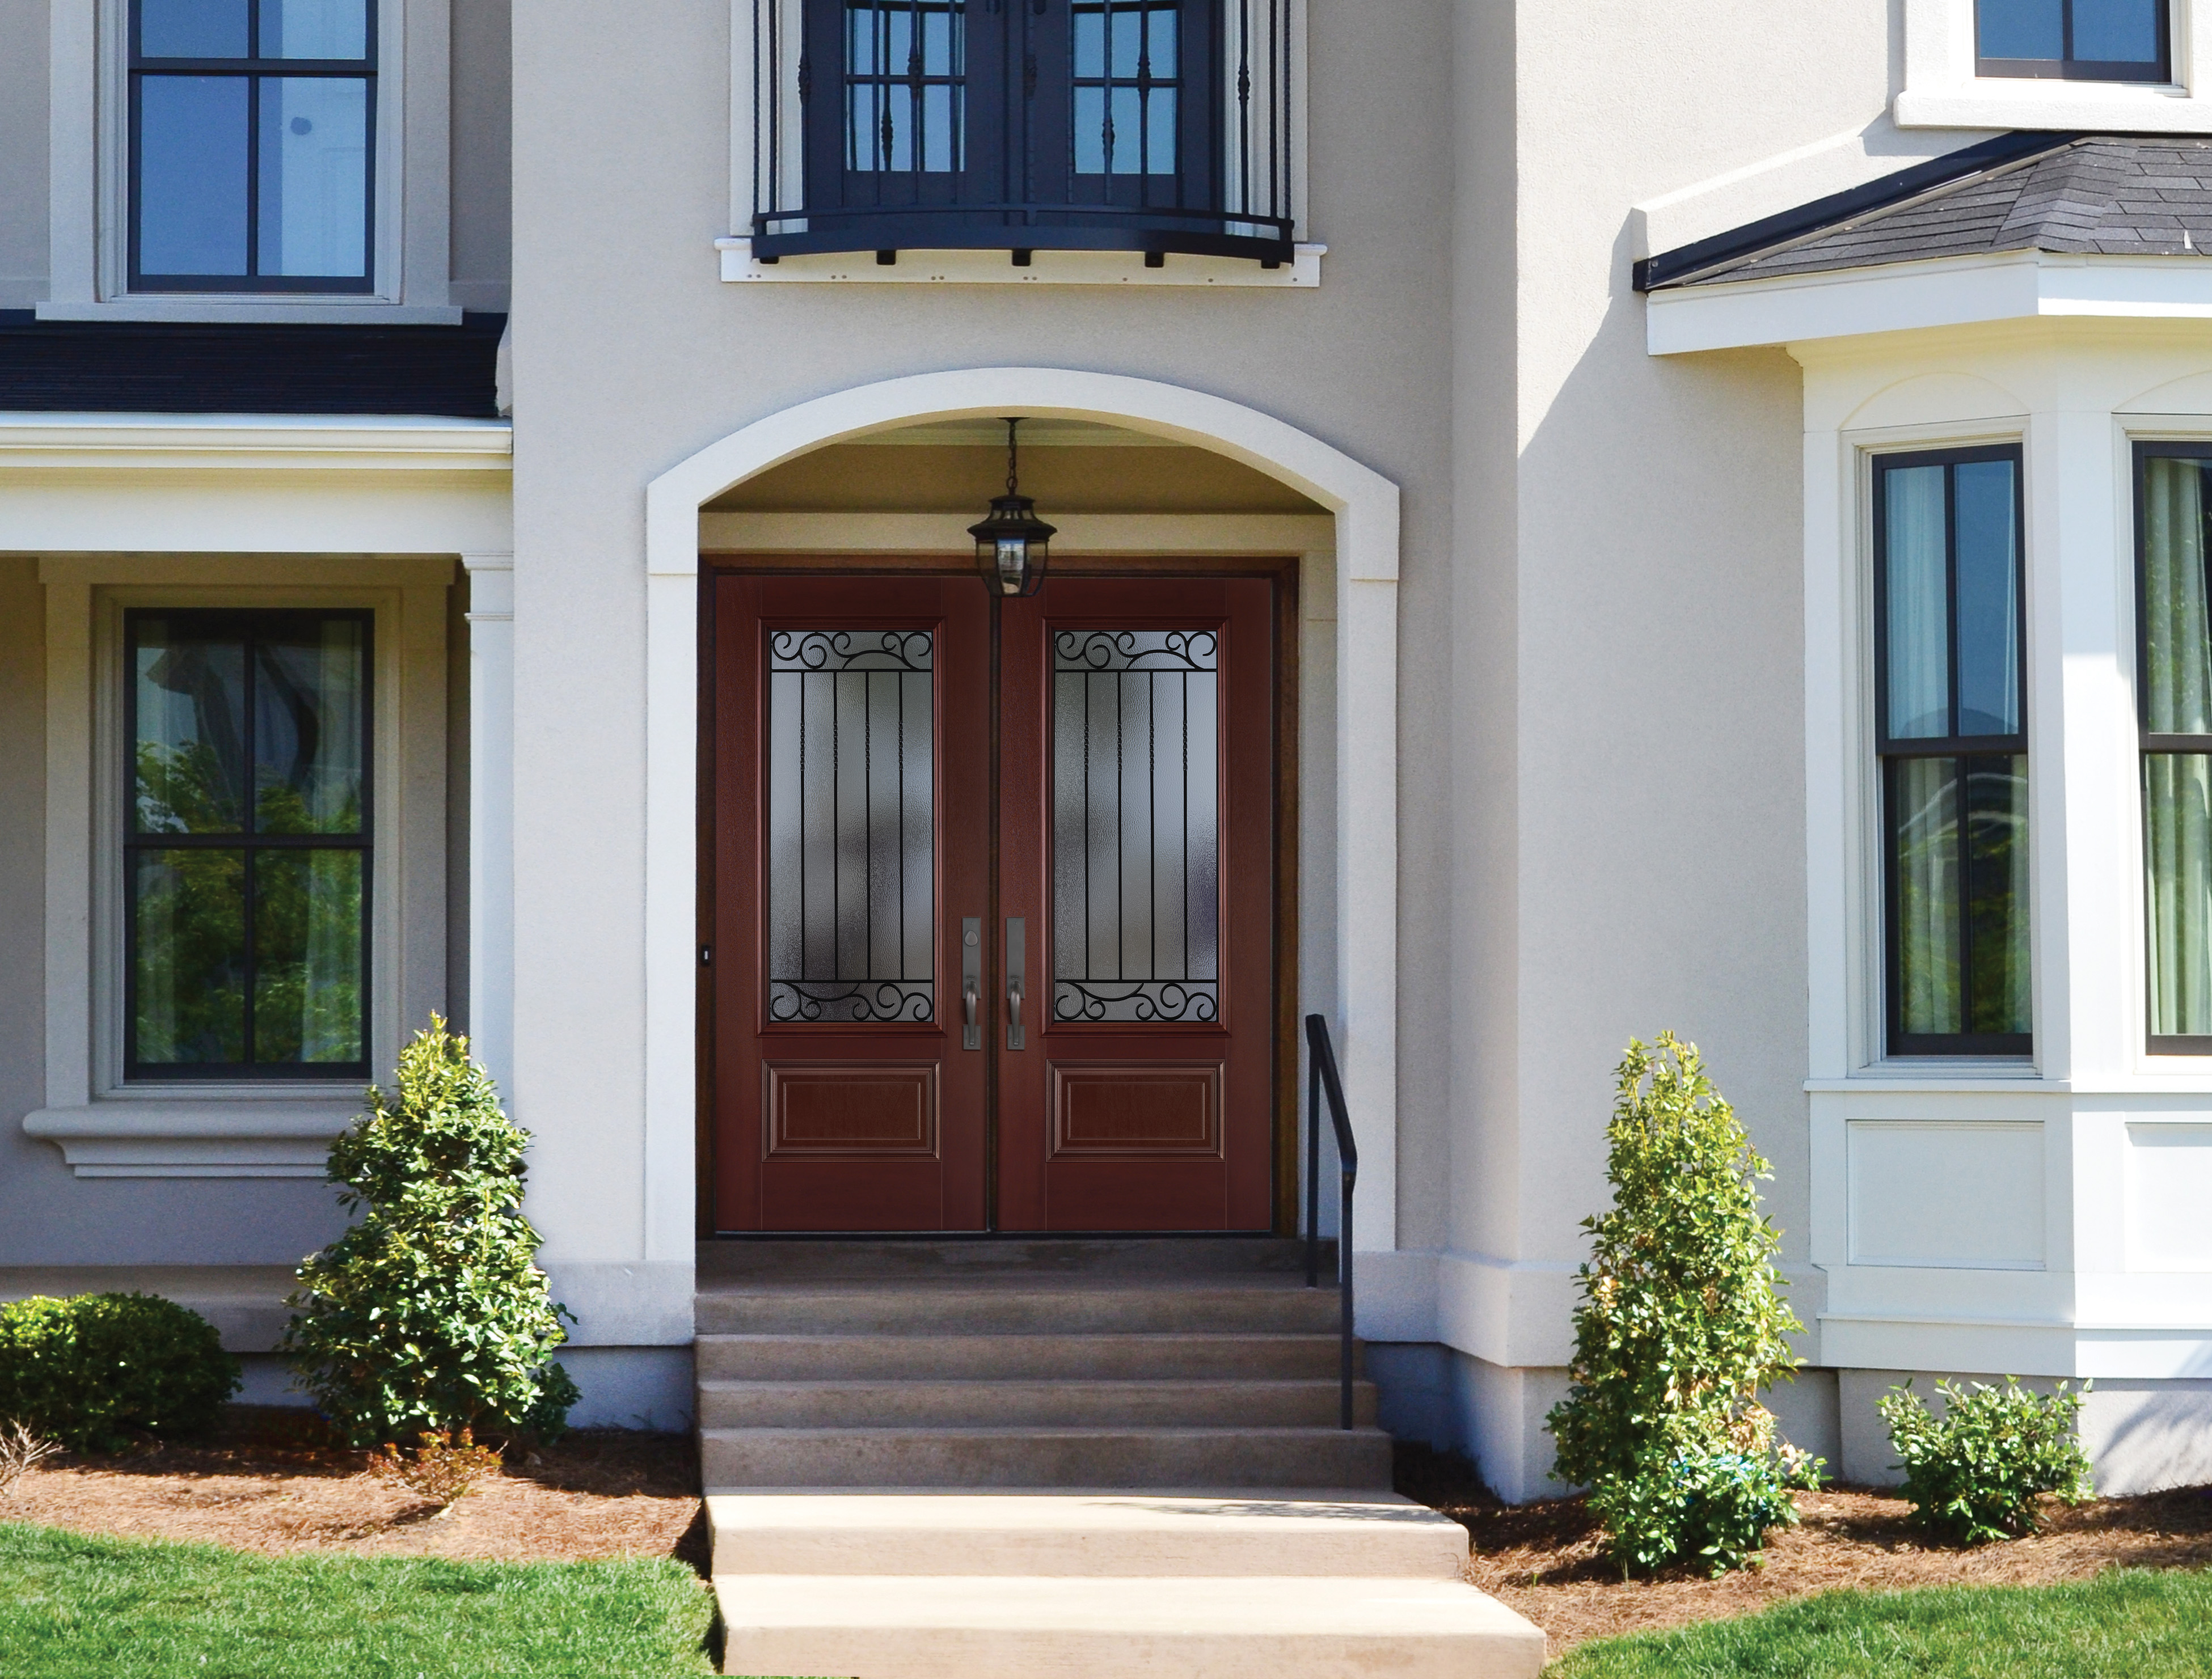 Fiberglass Exterior Doors: Fiberglass Entry Doors